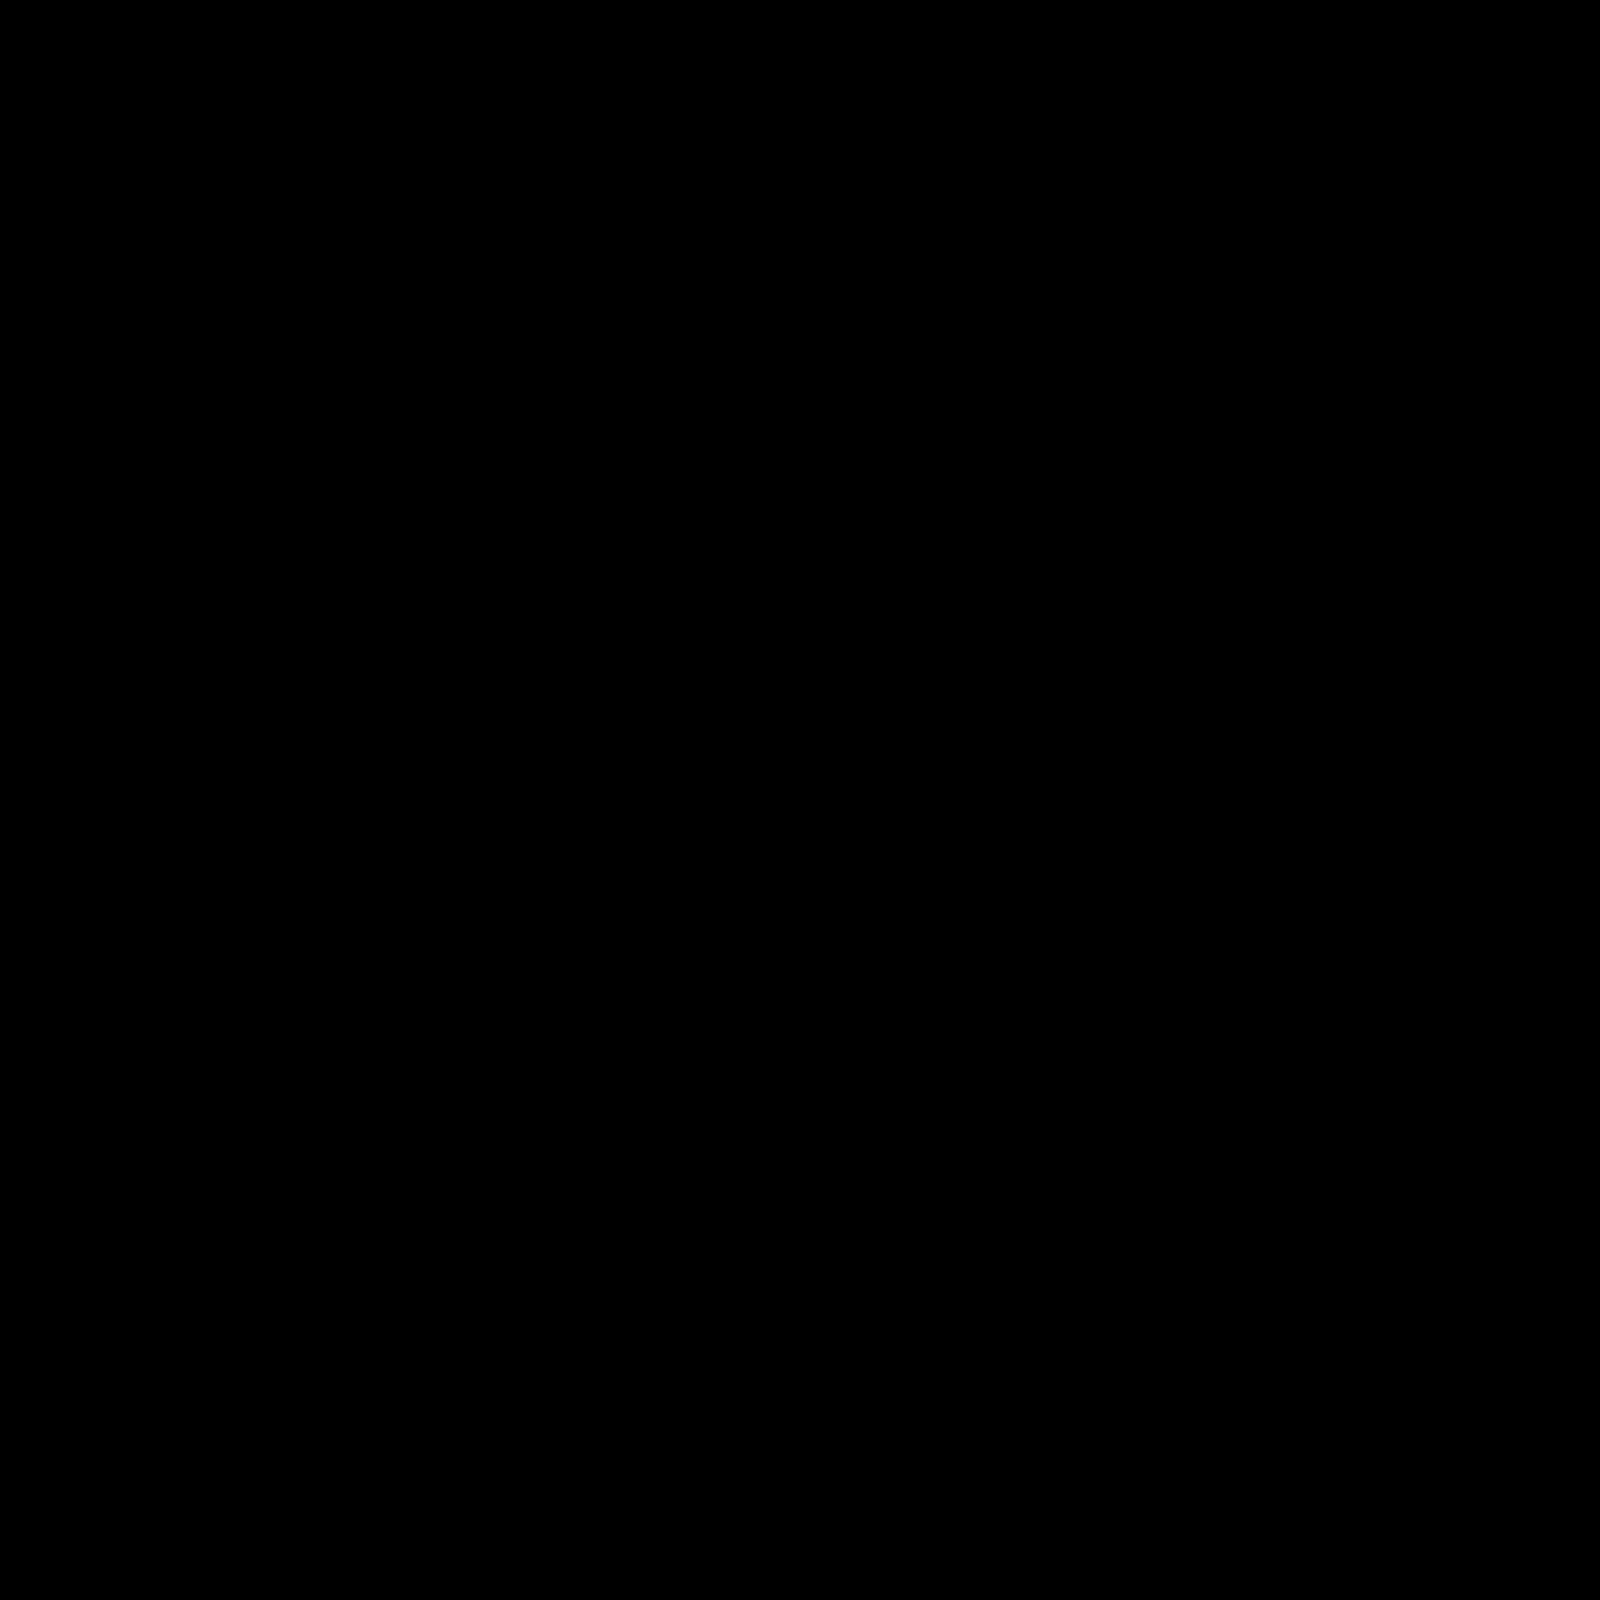 Drabina icon